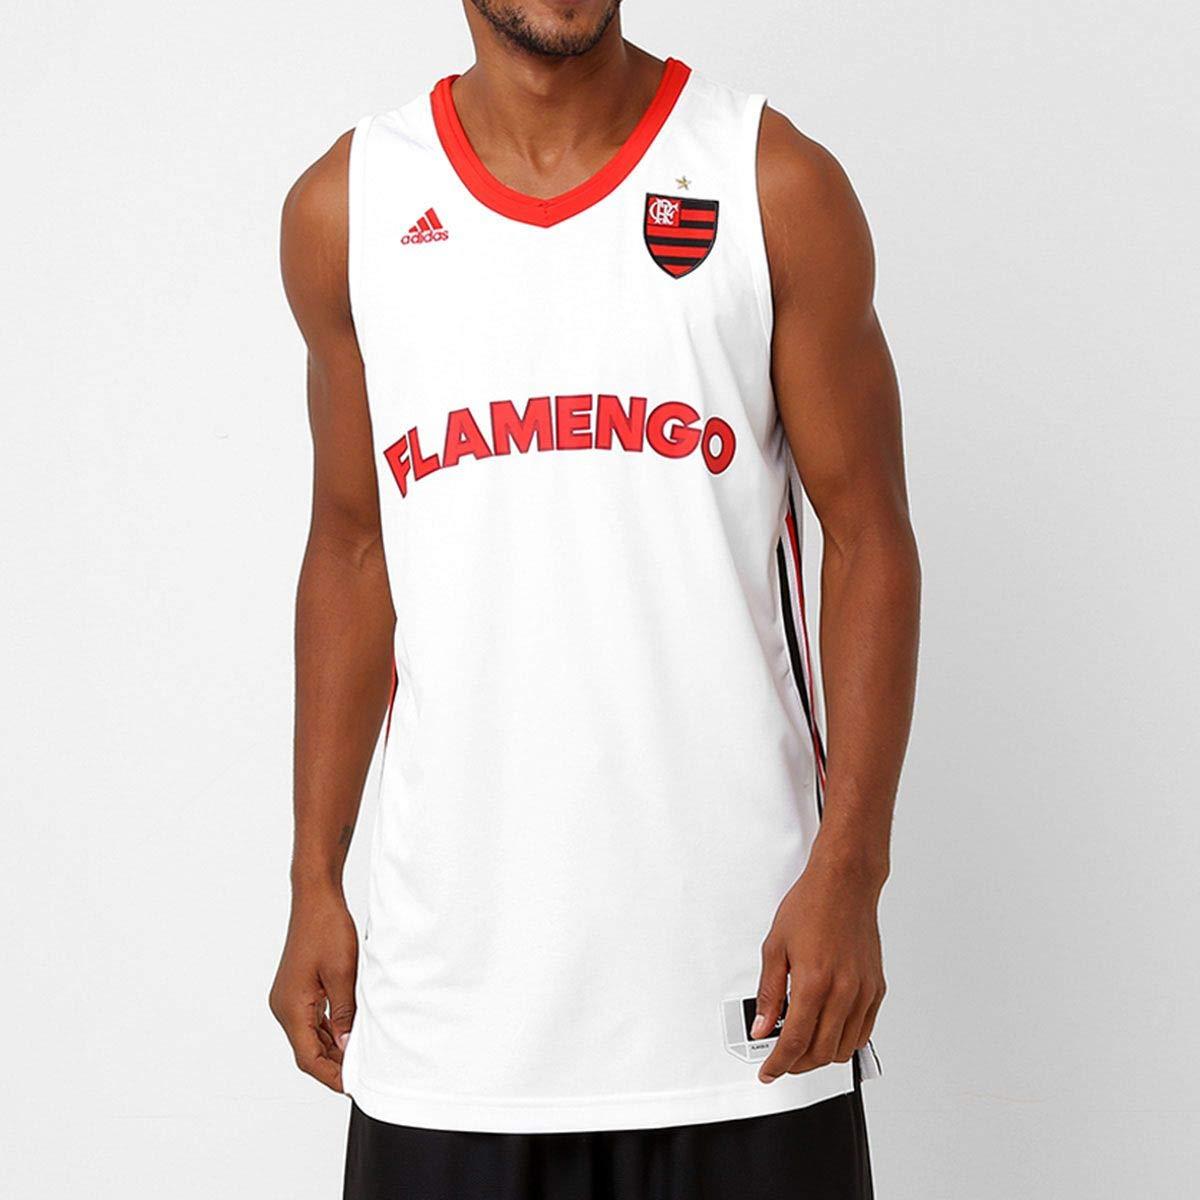 Regata Adidas Flamengo Basquete Oficial